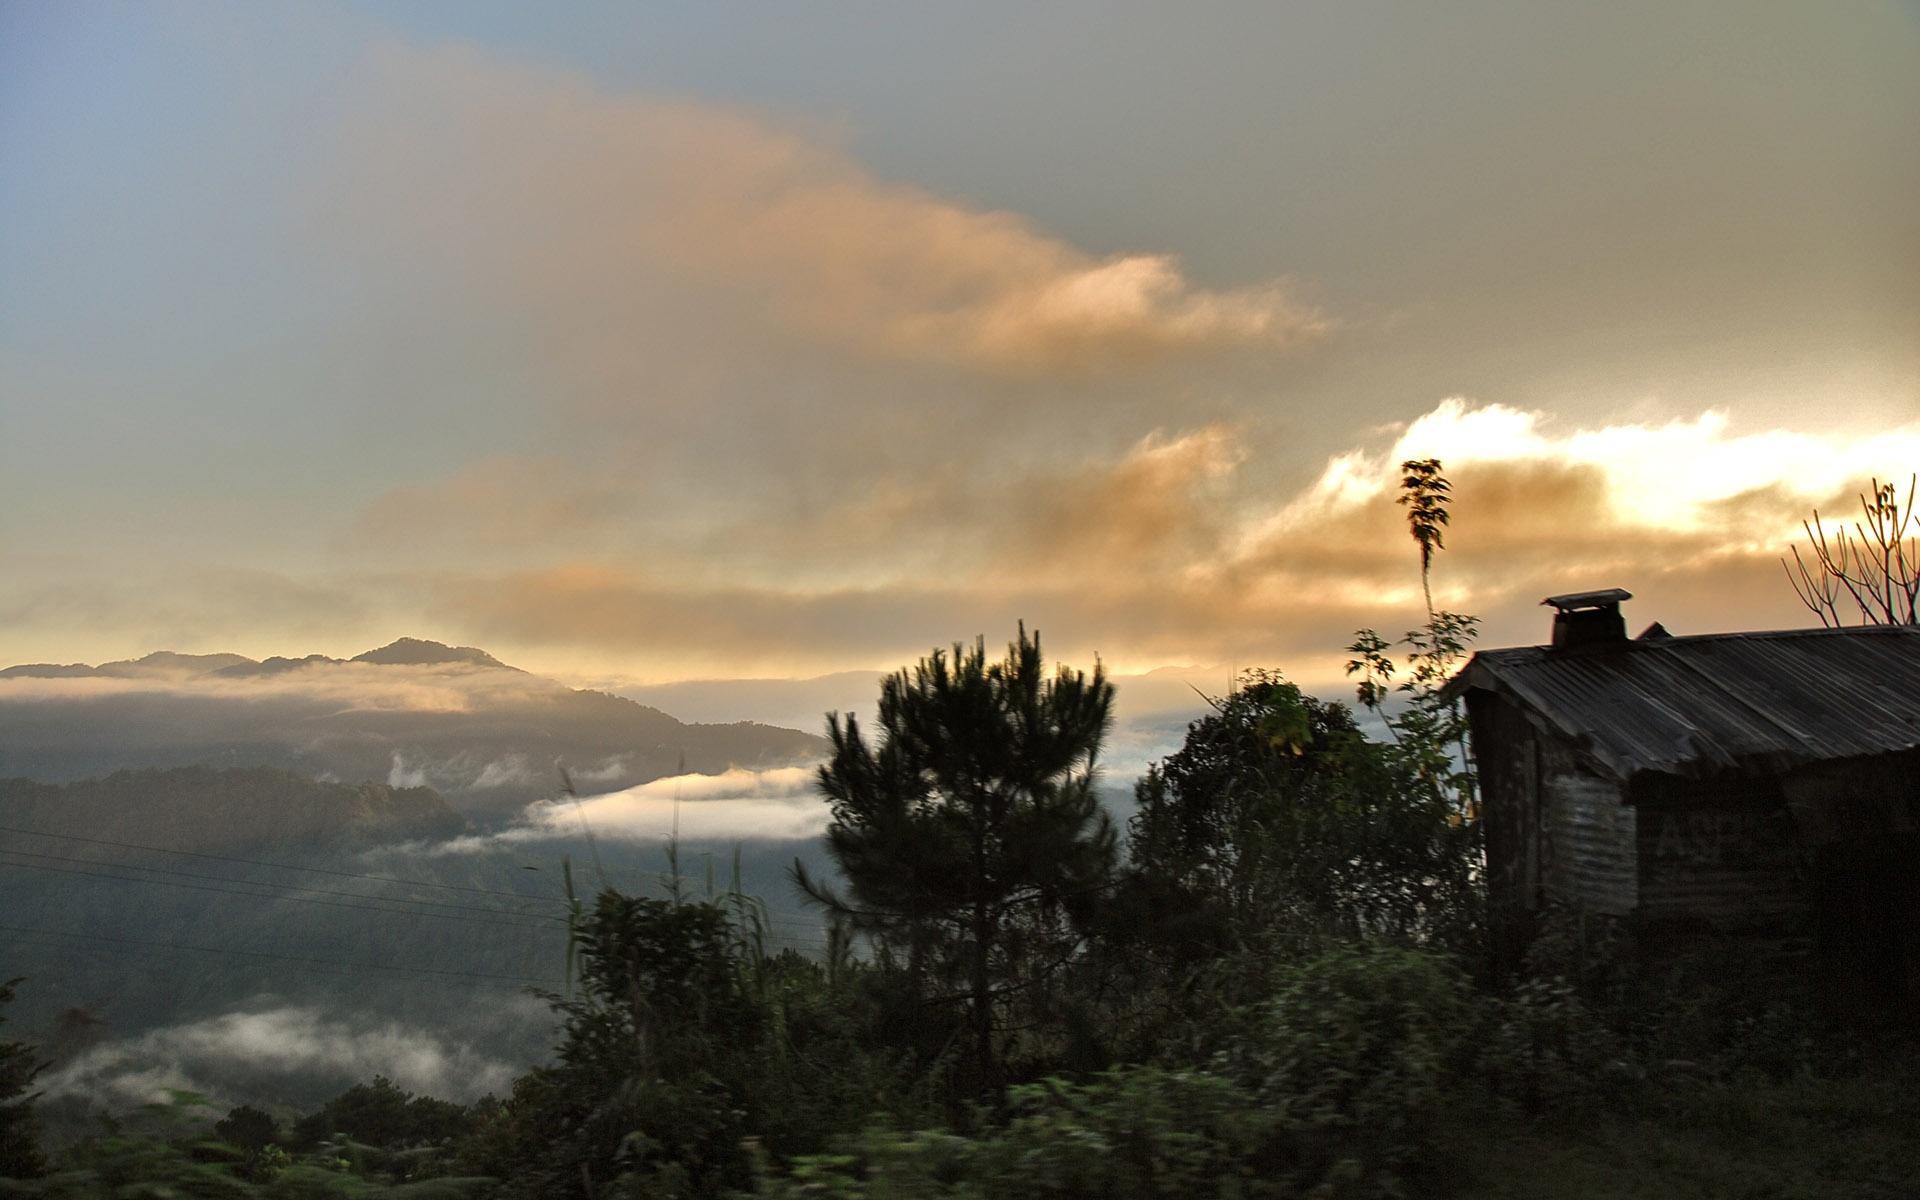 Sunrise Mountain Cabin wallpapers HD   428809 1920x1200